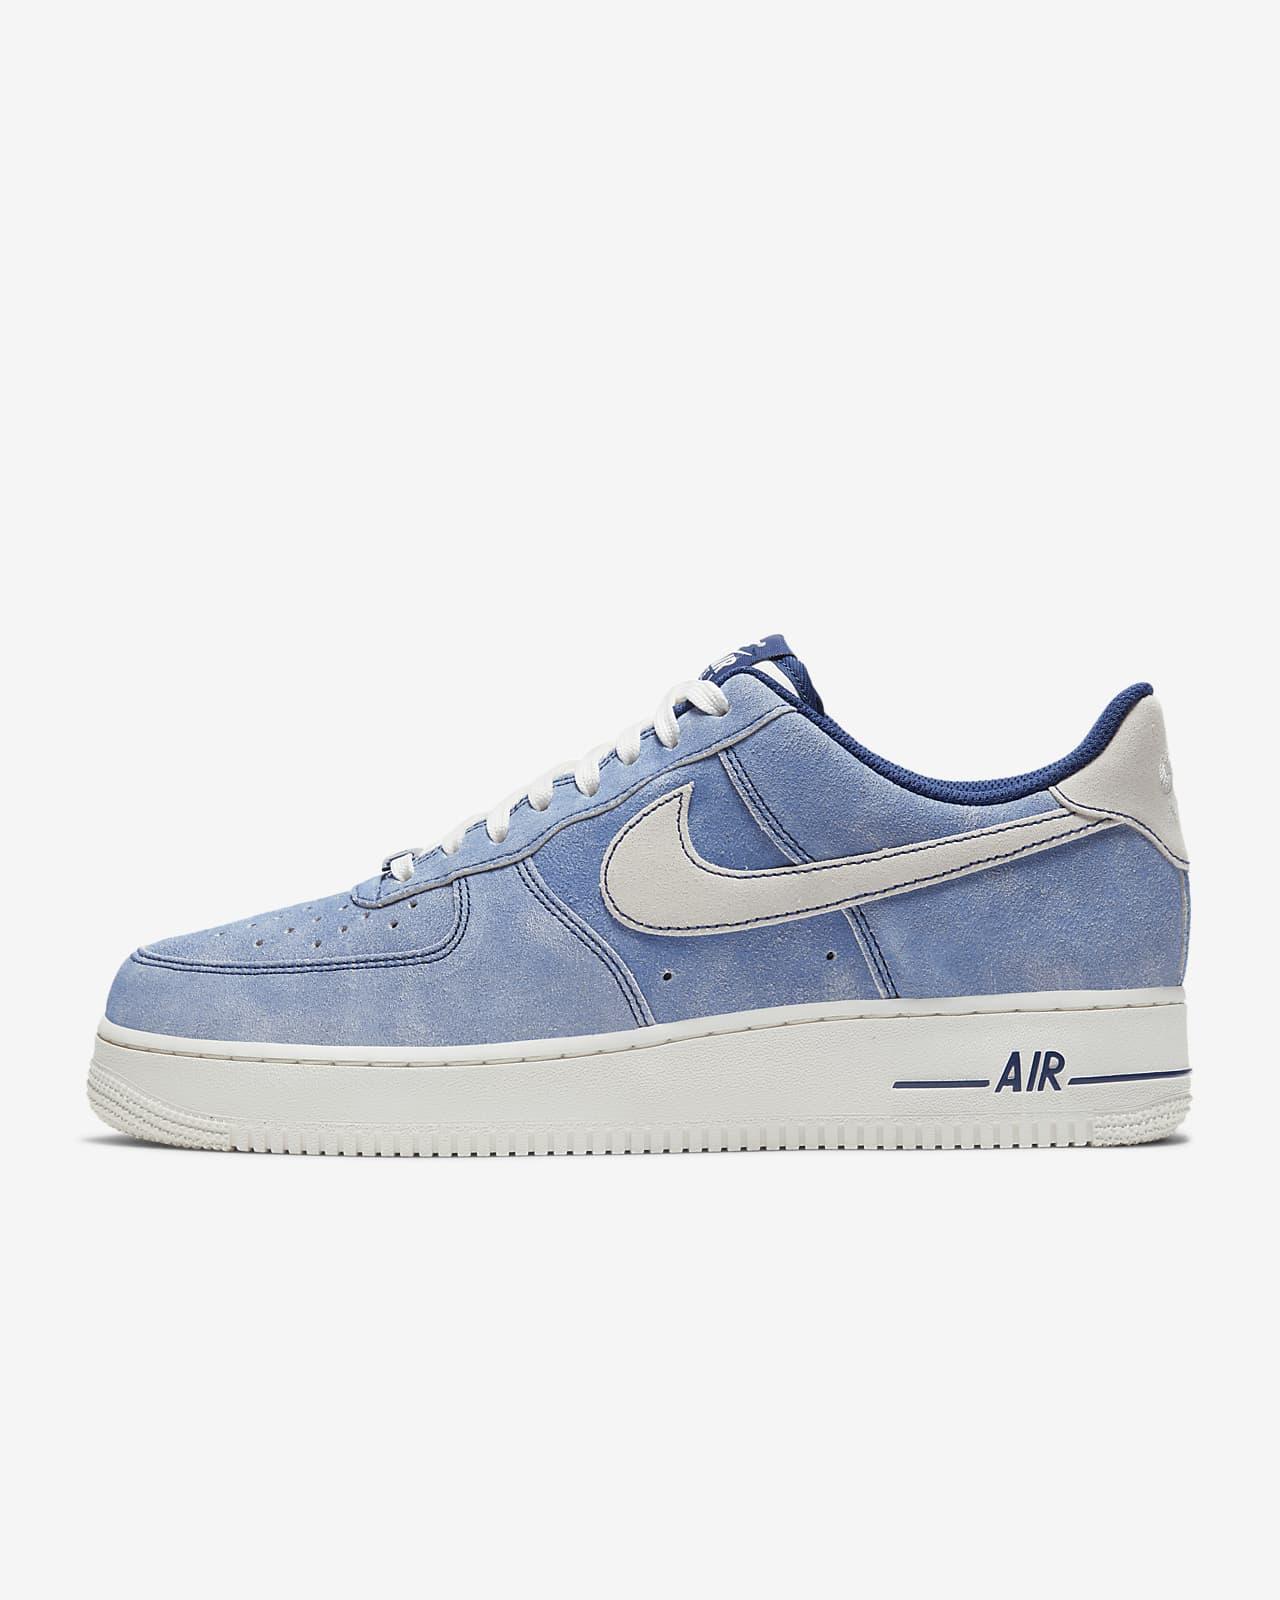 Nike Air Force 1 '07 LV8 'Blue Void'